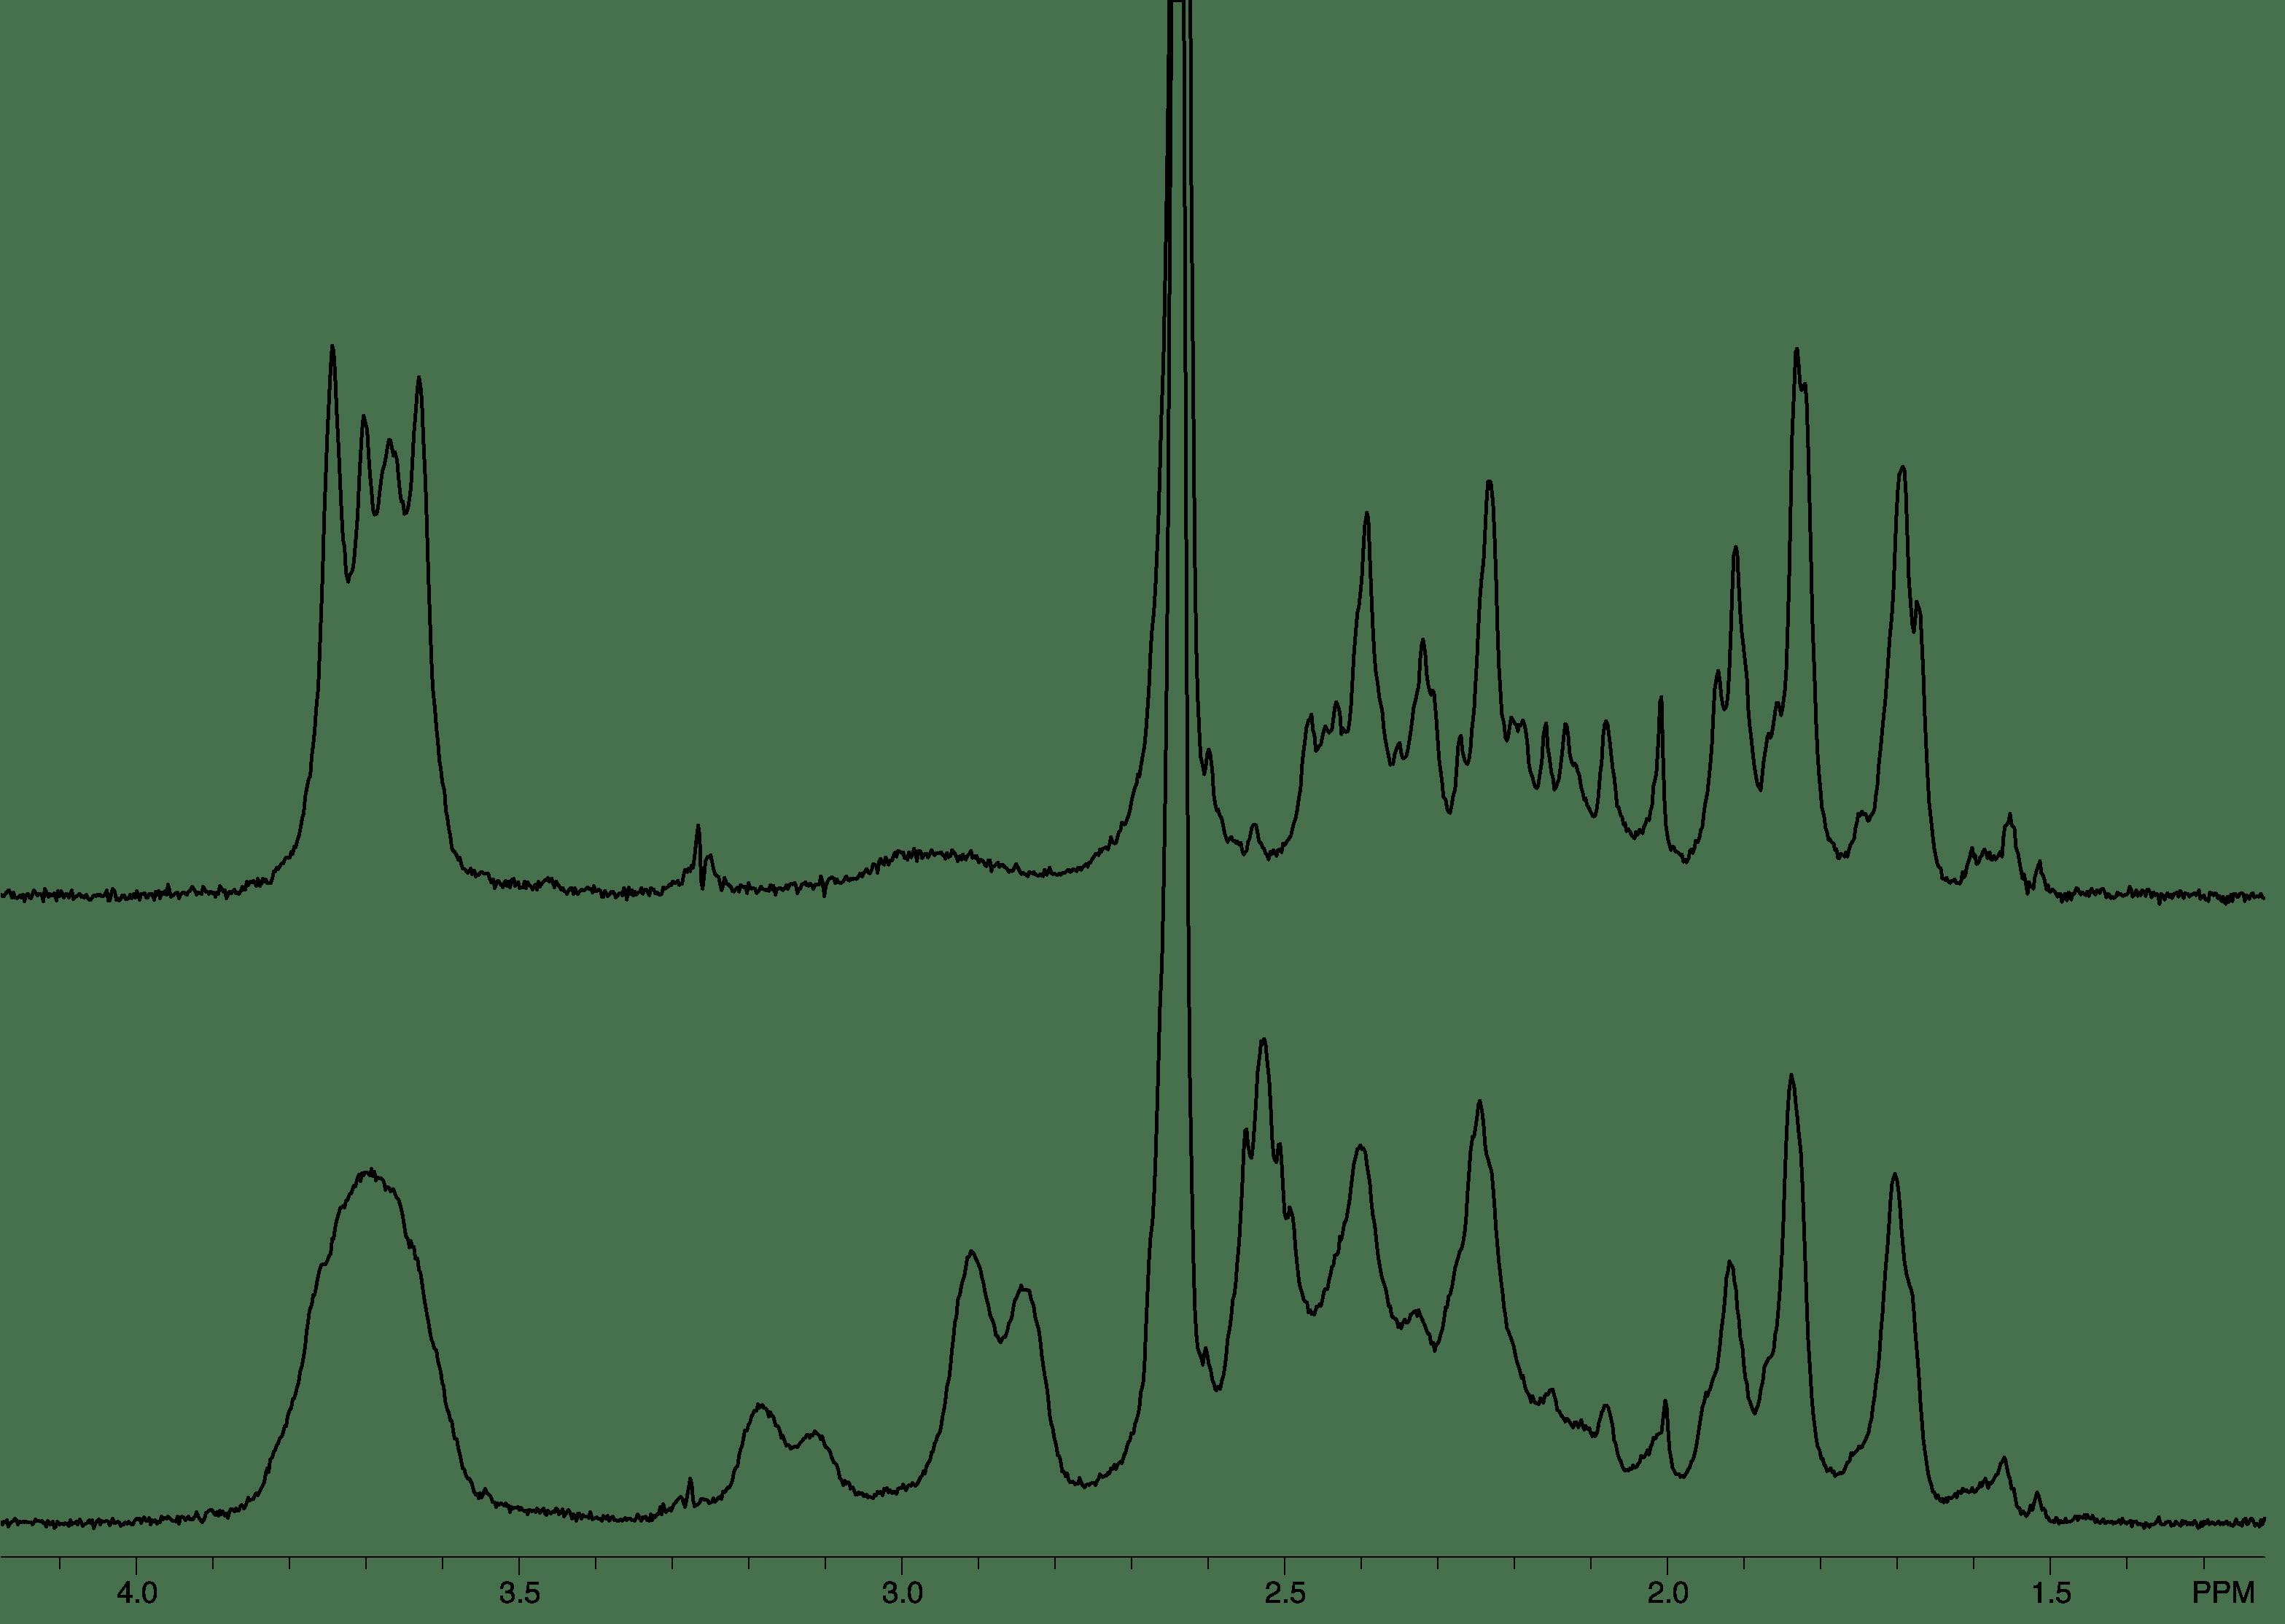 Anasazi Instruments Tropinone 1H spectrum overlay graph